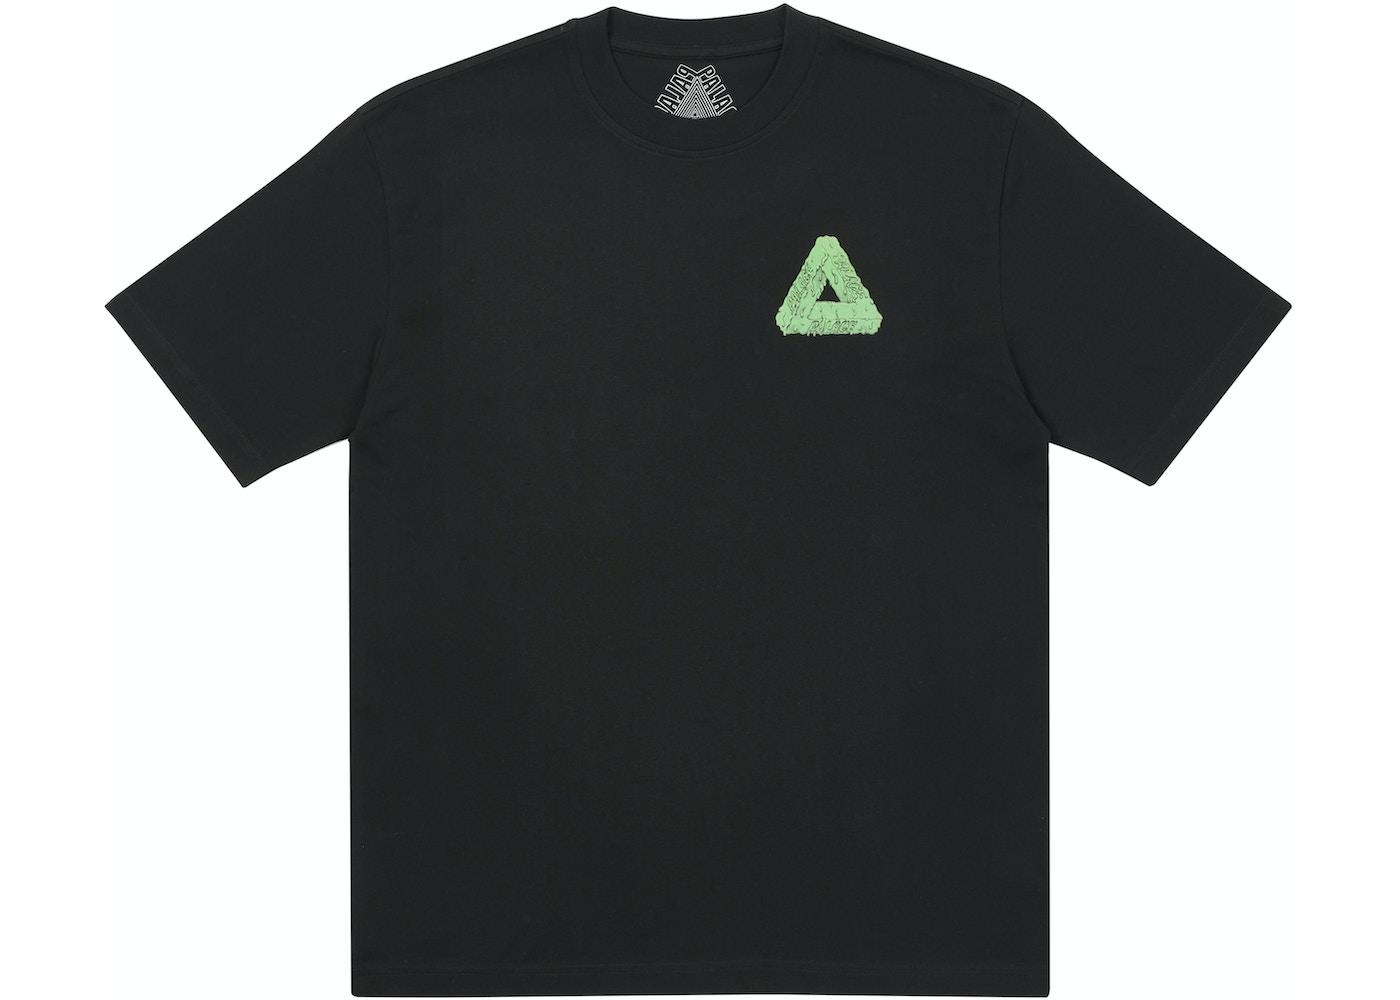 Palace Tri-Slime T-Shirt Black - SS21